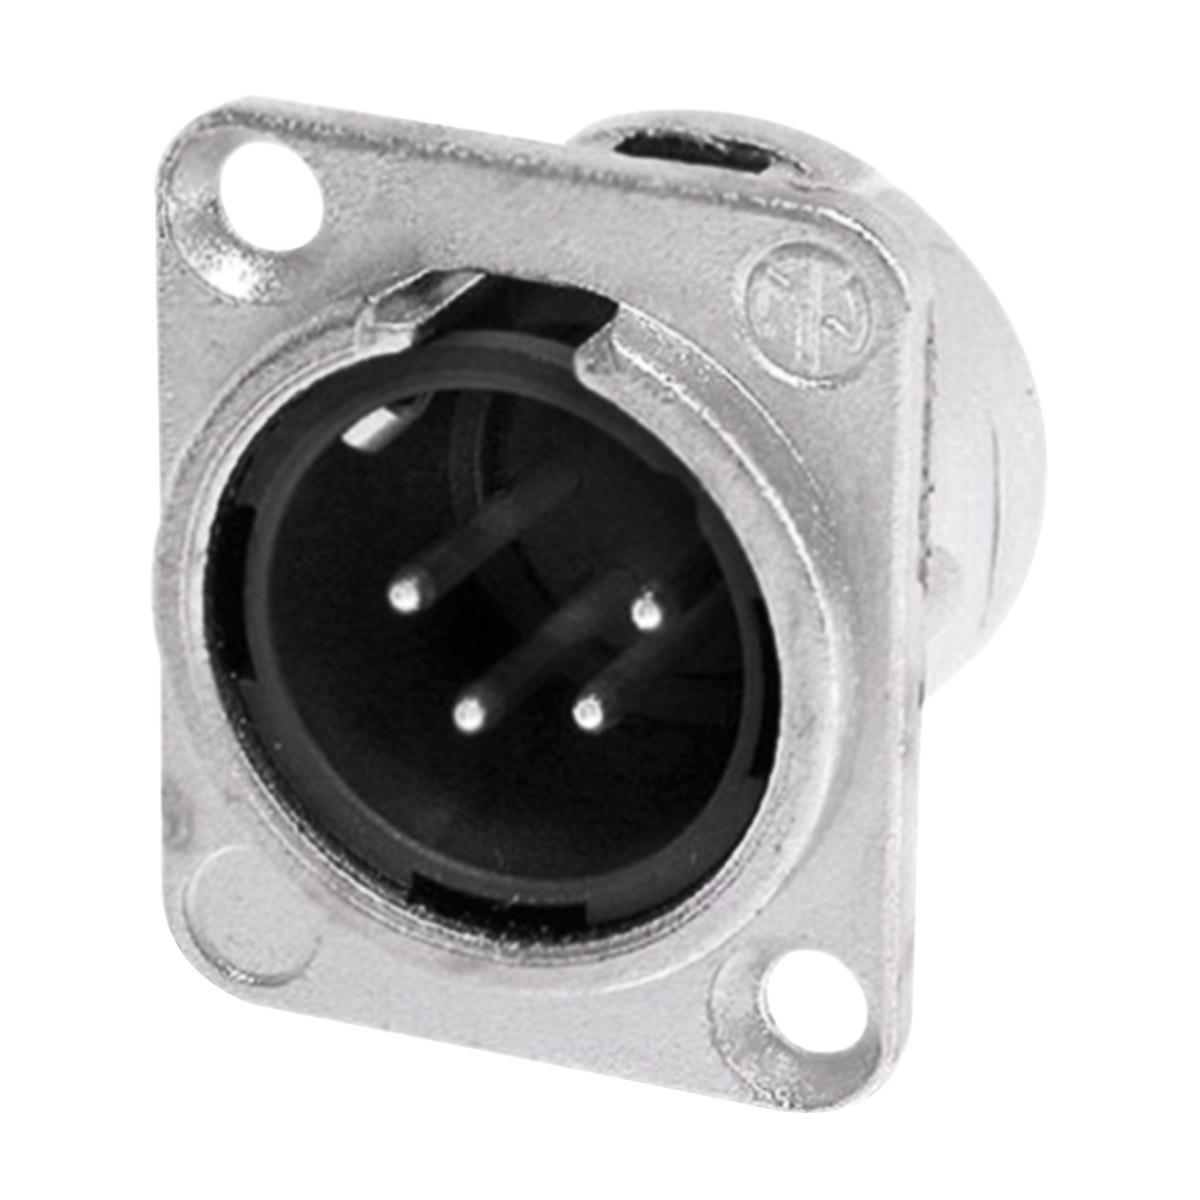 NEUTRIK NC4MD-L-1 4 Poles Male XLR Plug Silver Plated